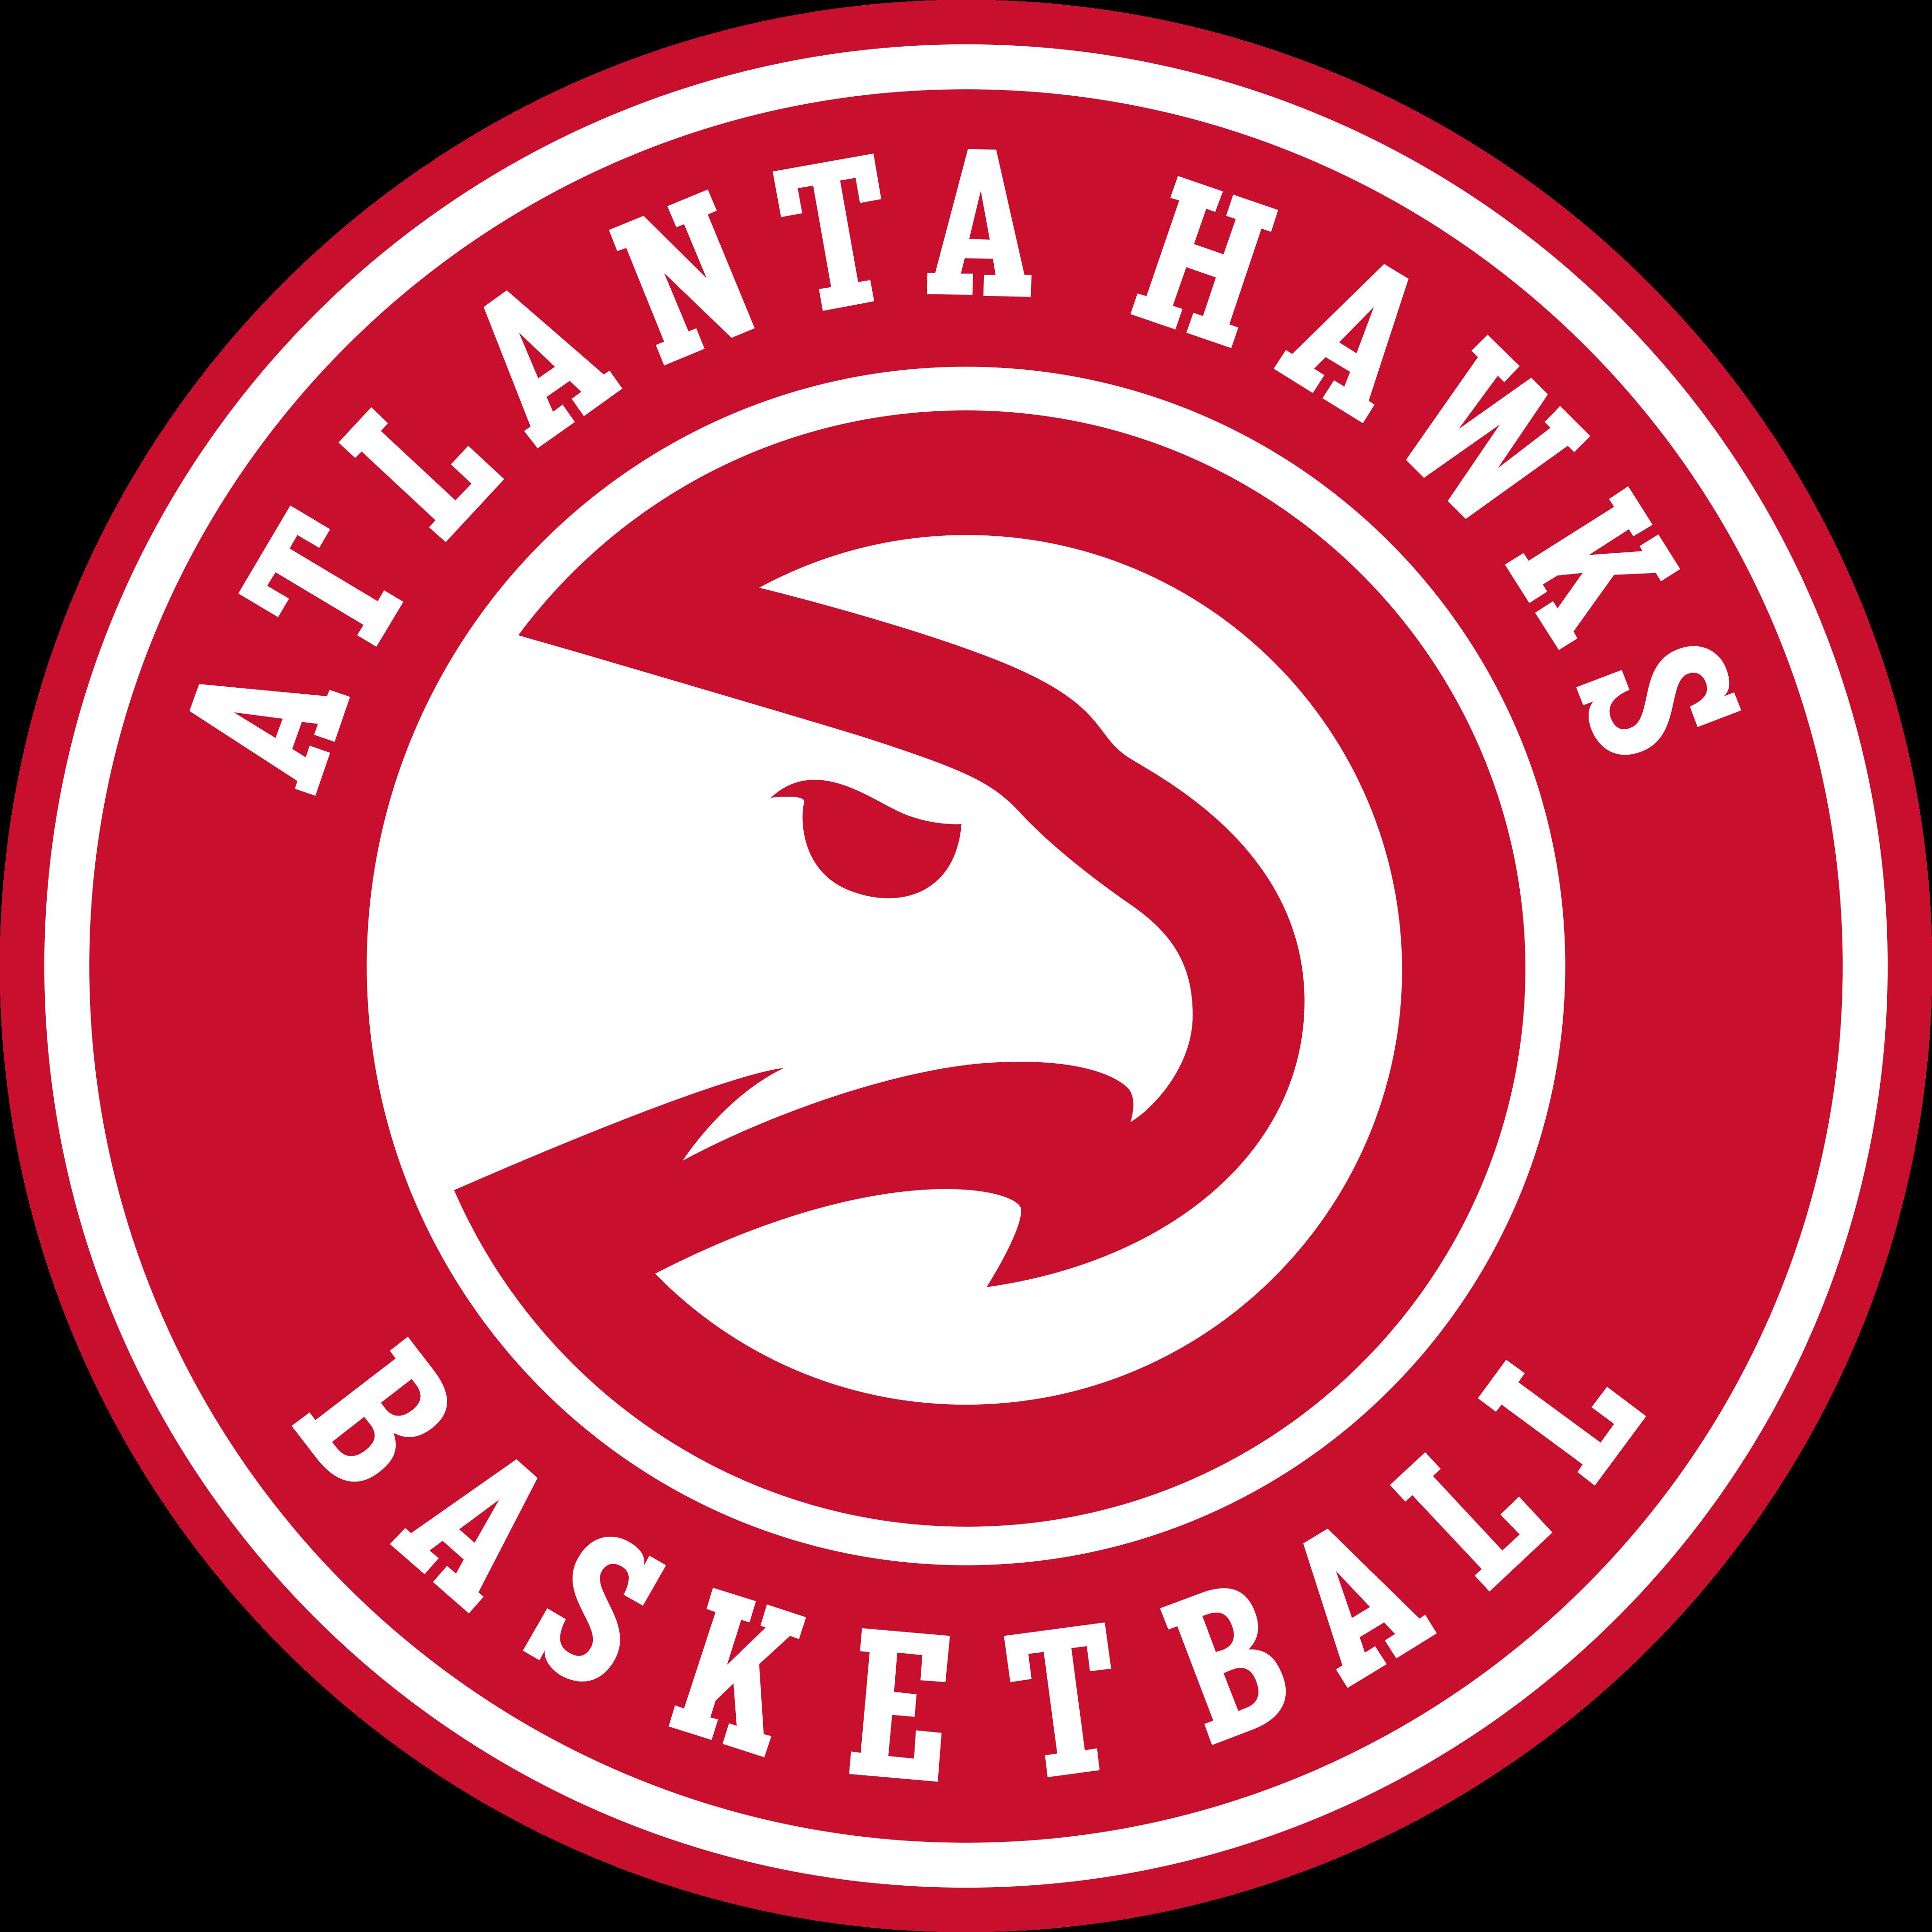 atlanta hawks logo 1 - Atlanta Hawks Logo